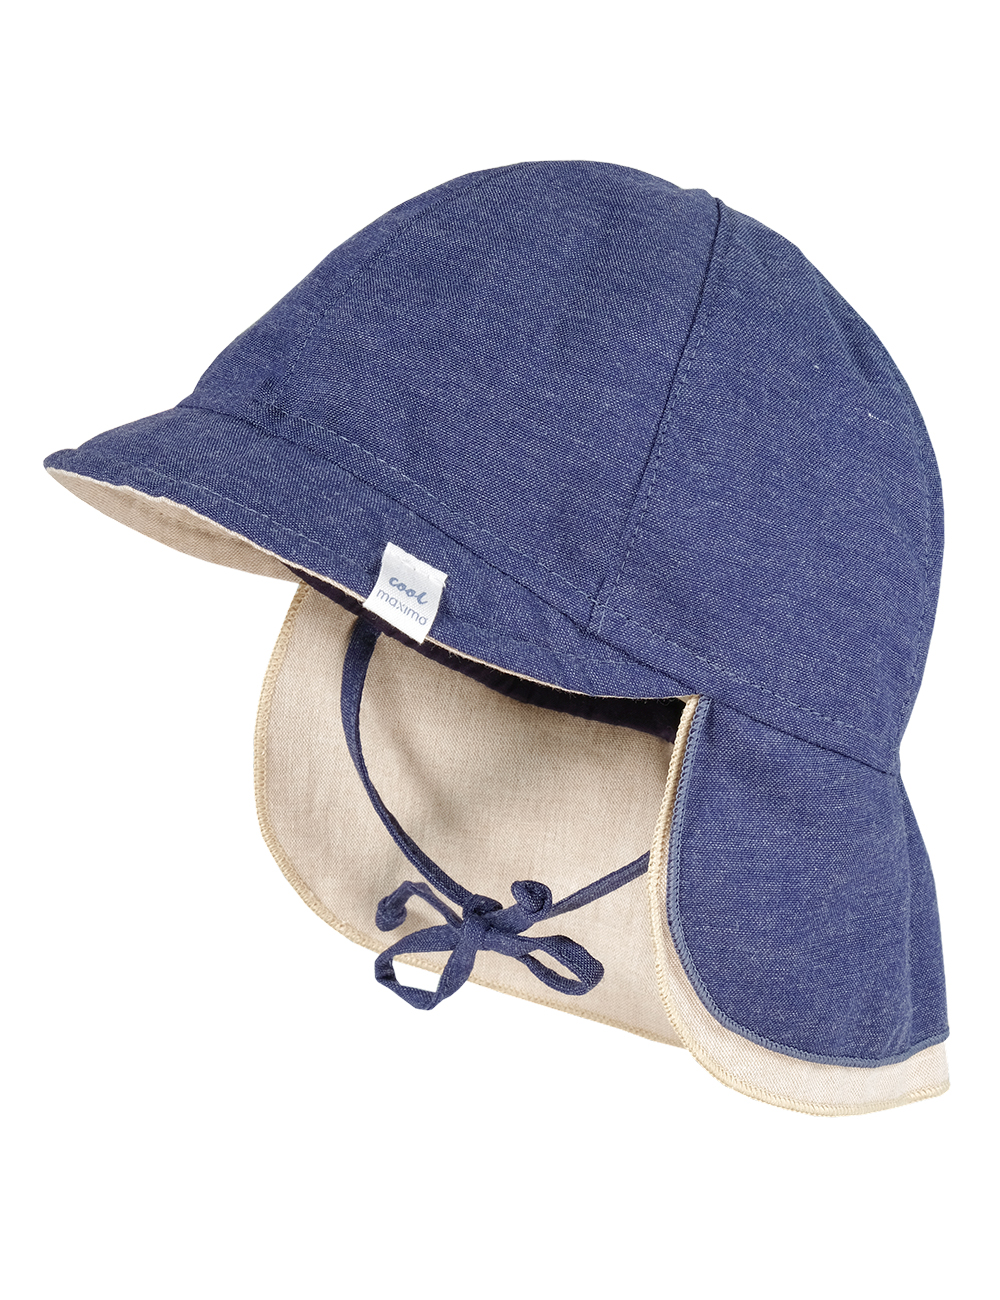 Schildmütze 43 Maximo. Farbe: jeansmeliert, Größe: 43